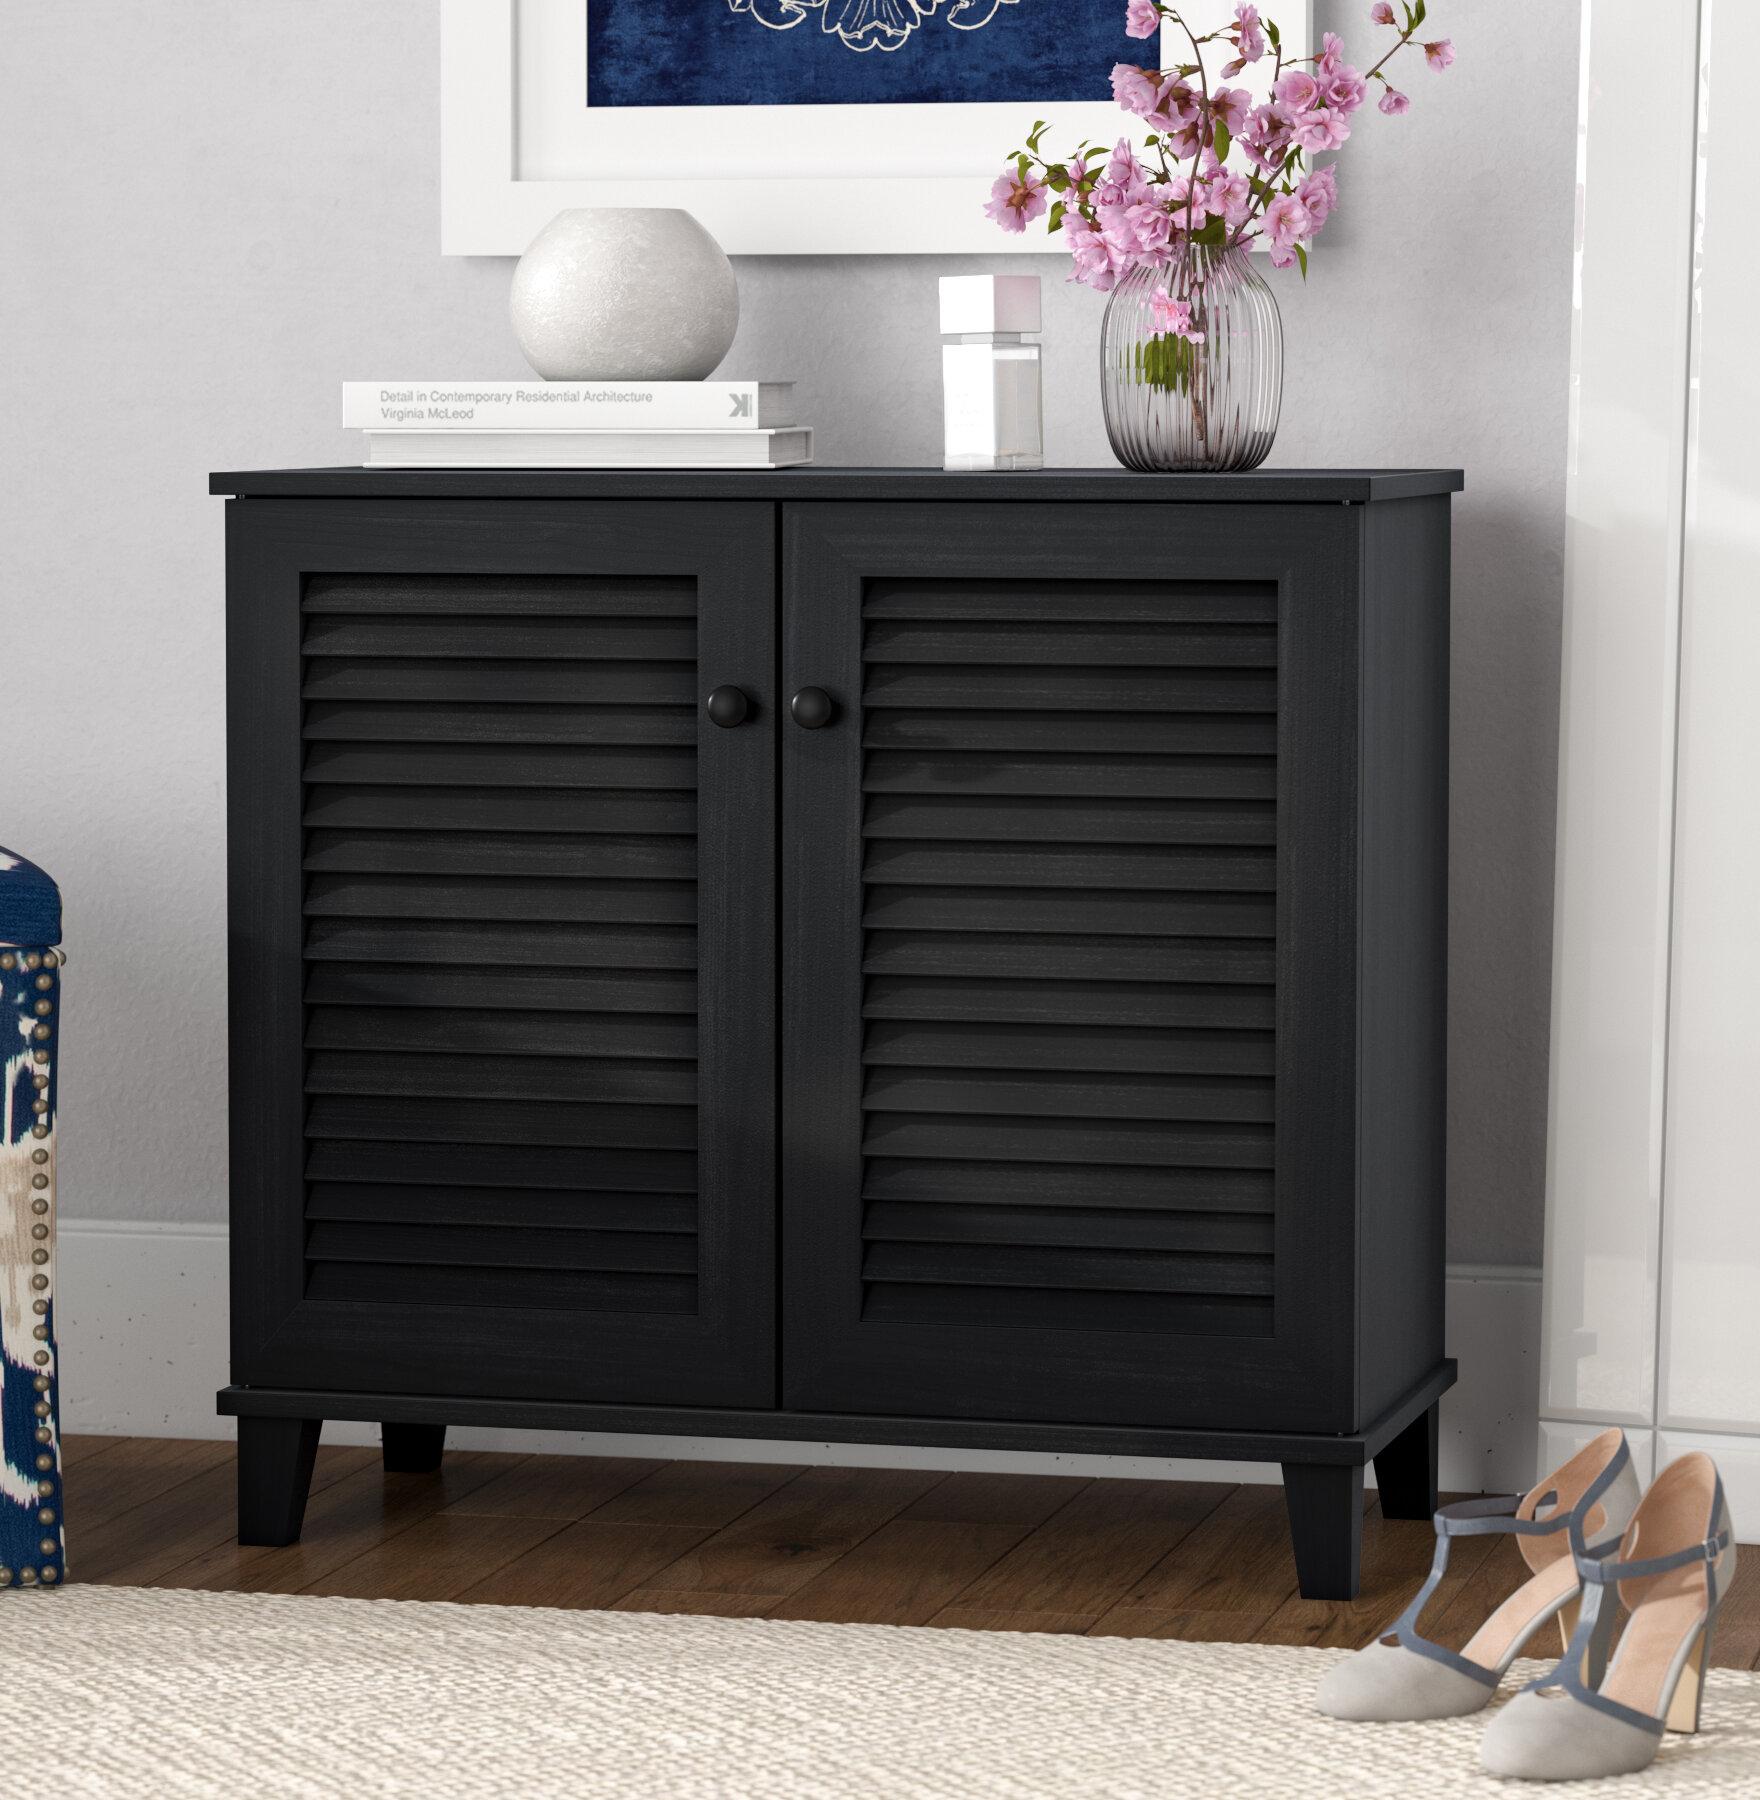 Darby Home Co Baxton Studio 14 Pair Shoe Storage Cabinet Reviews Wayfair